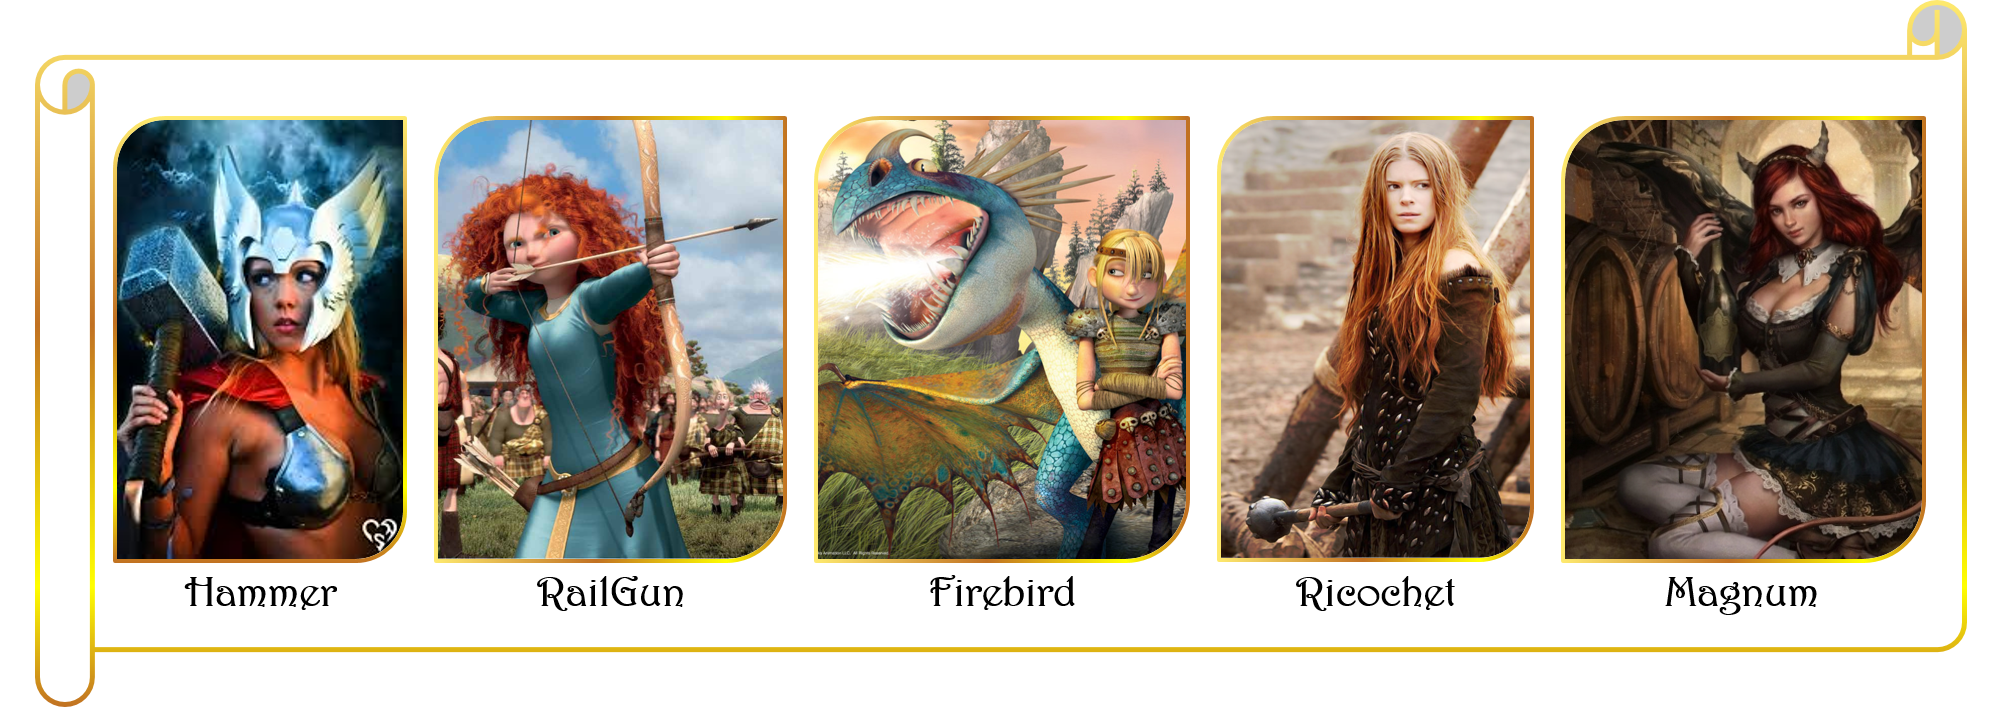 Hunter clipart hunter gatherer. Issue fools guide viking